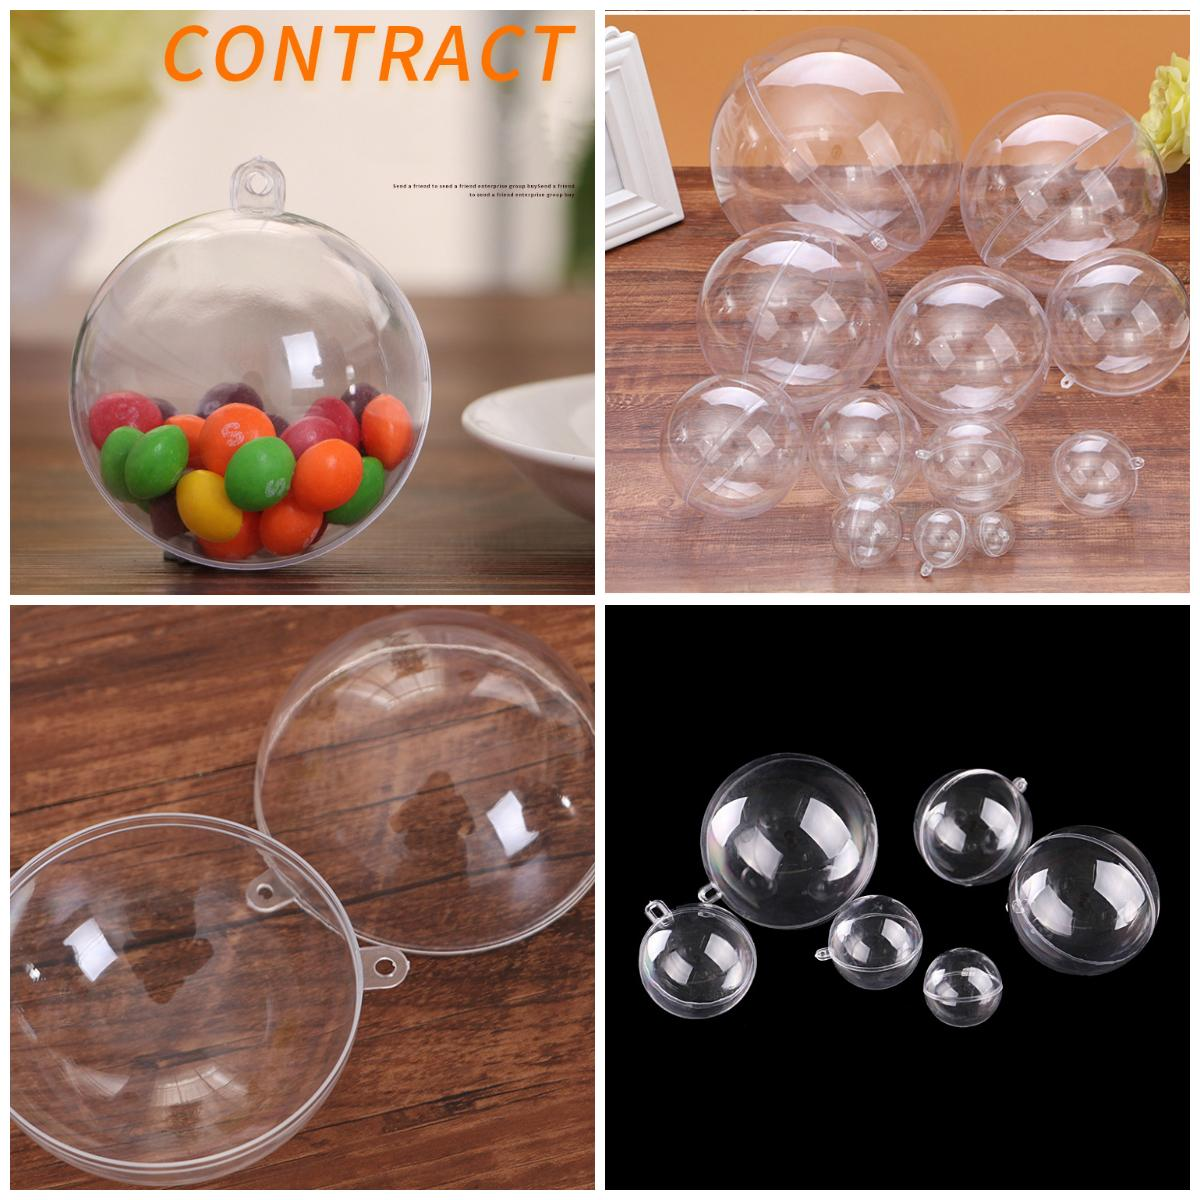 New 3cm-16cm high definition transparent ball festival decorations transparent ball plastic Christmas gift ball Gift decoration T3I5499